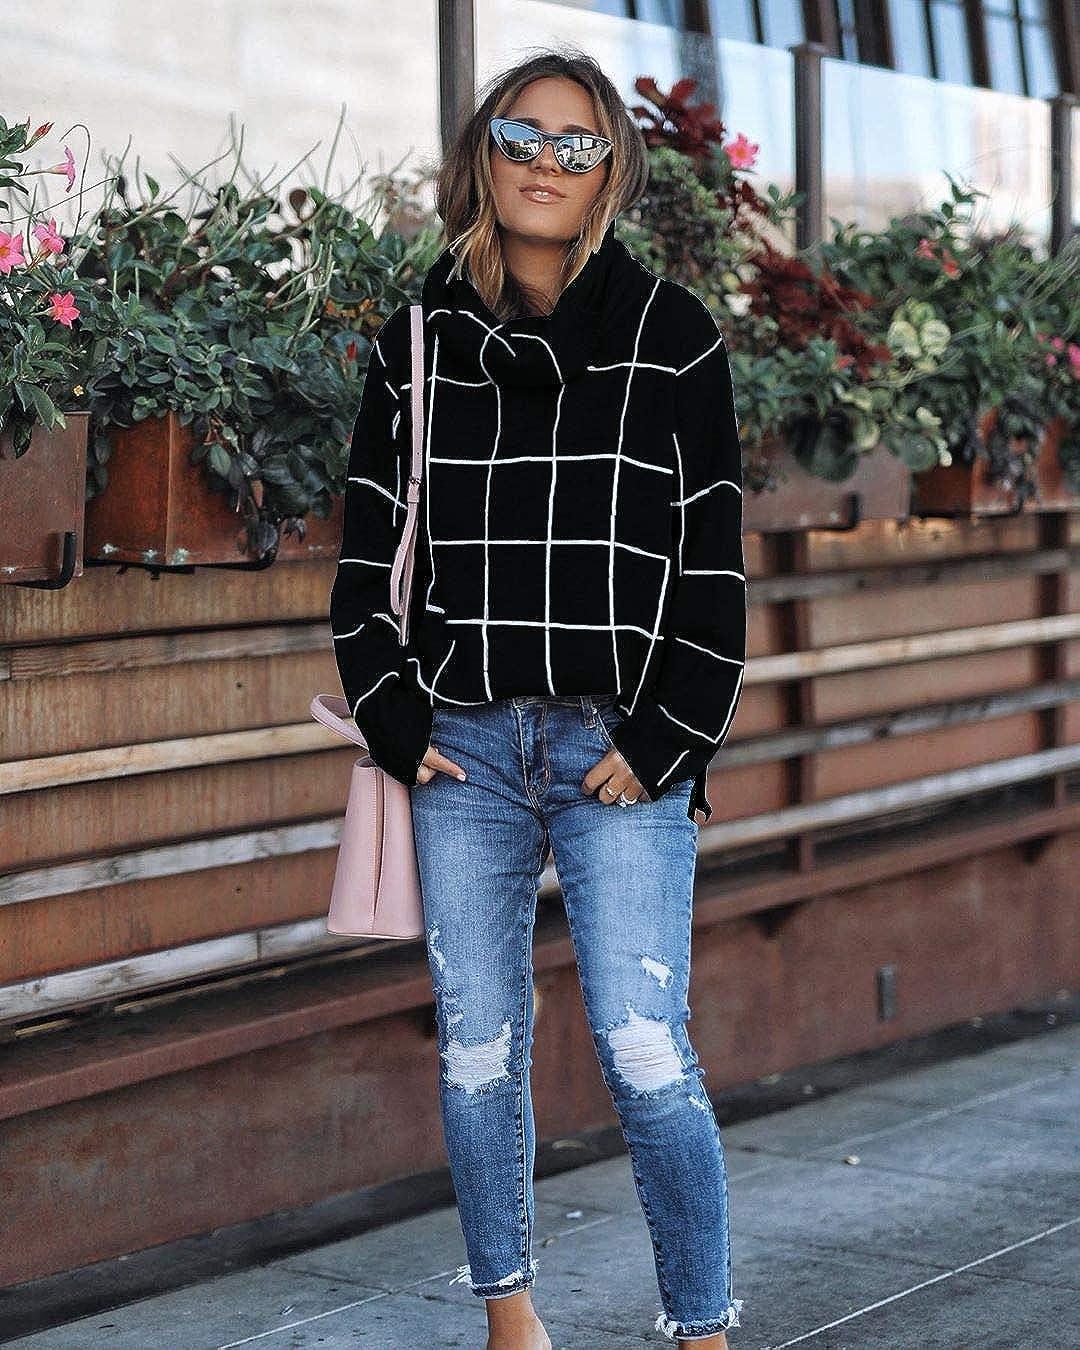 Hiistandd Damen Pullover Farbblock Langarmshirt Kurze Länge Gestrickt Sweatshirt Casual Lose Oberteile Oversize Stil1-schwarz